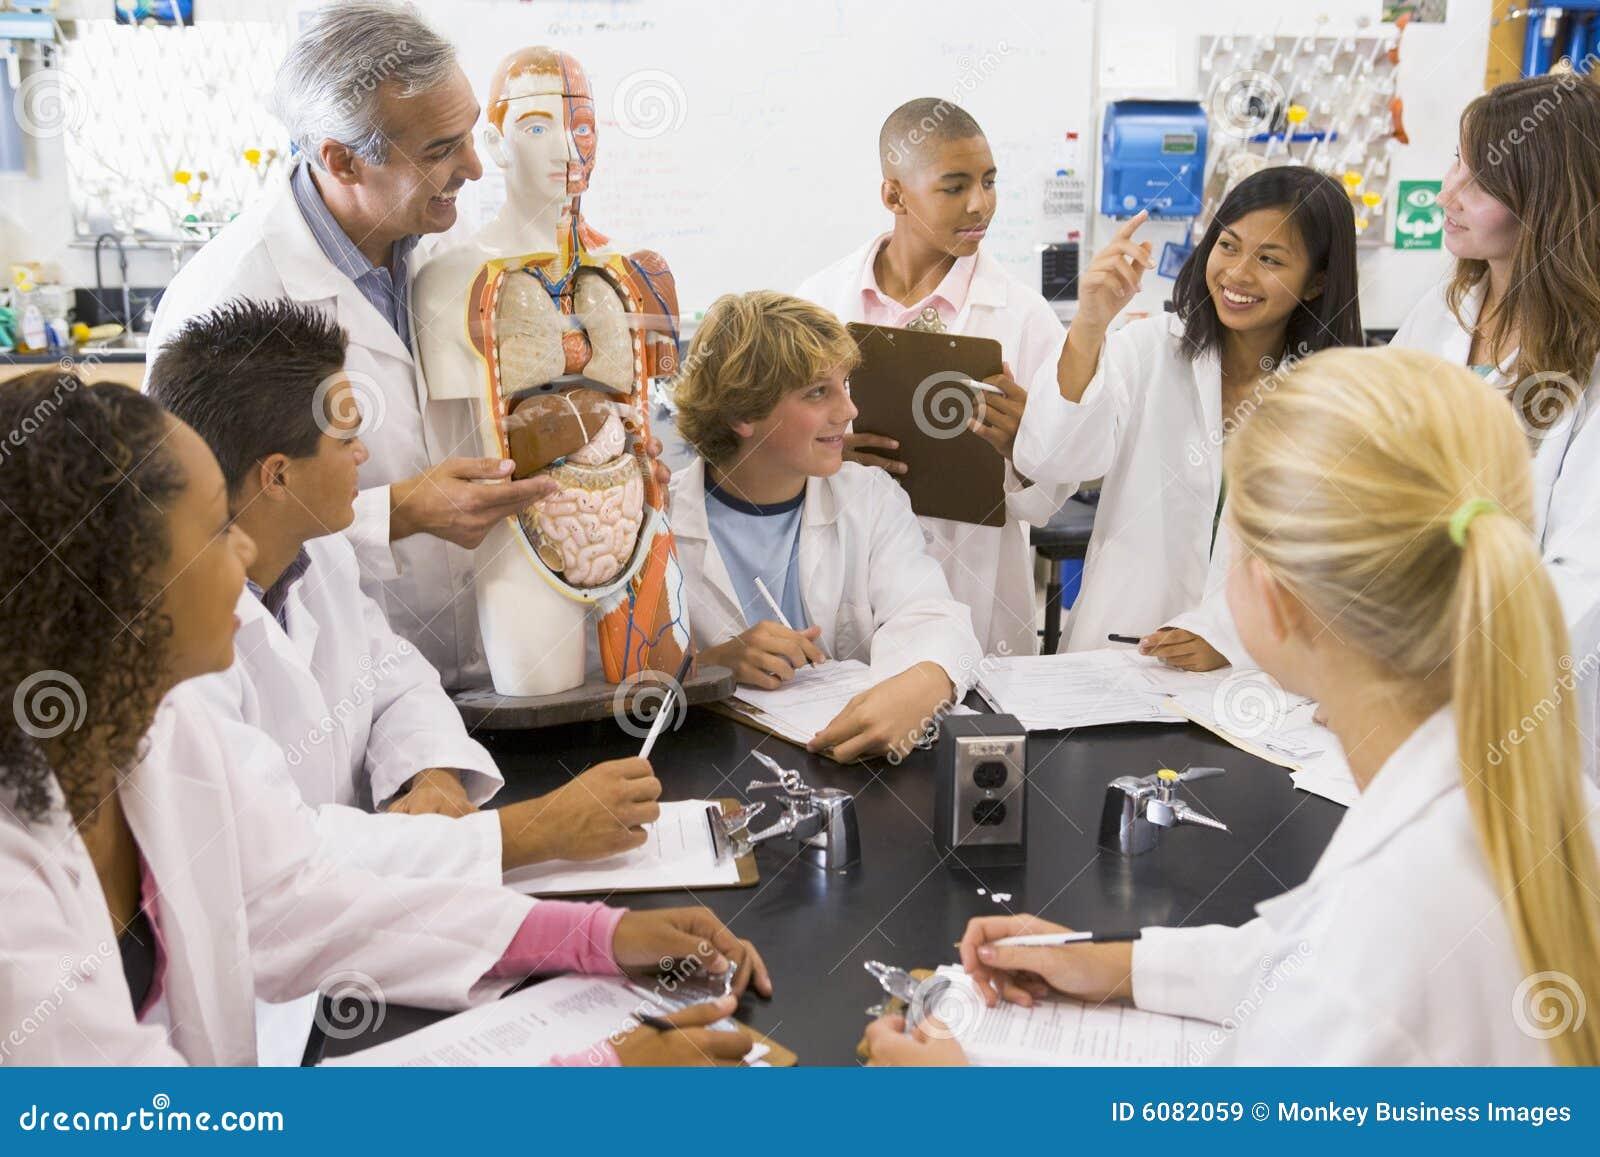 School Children And Their Teacher In Science Class Stock